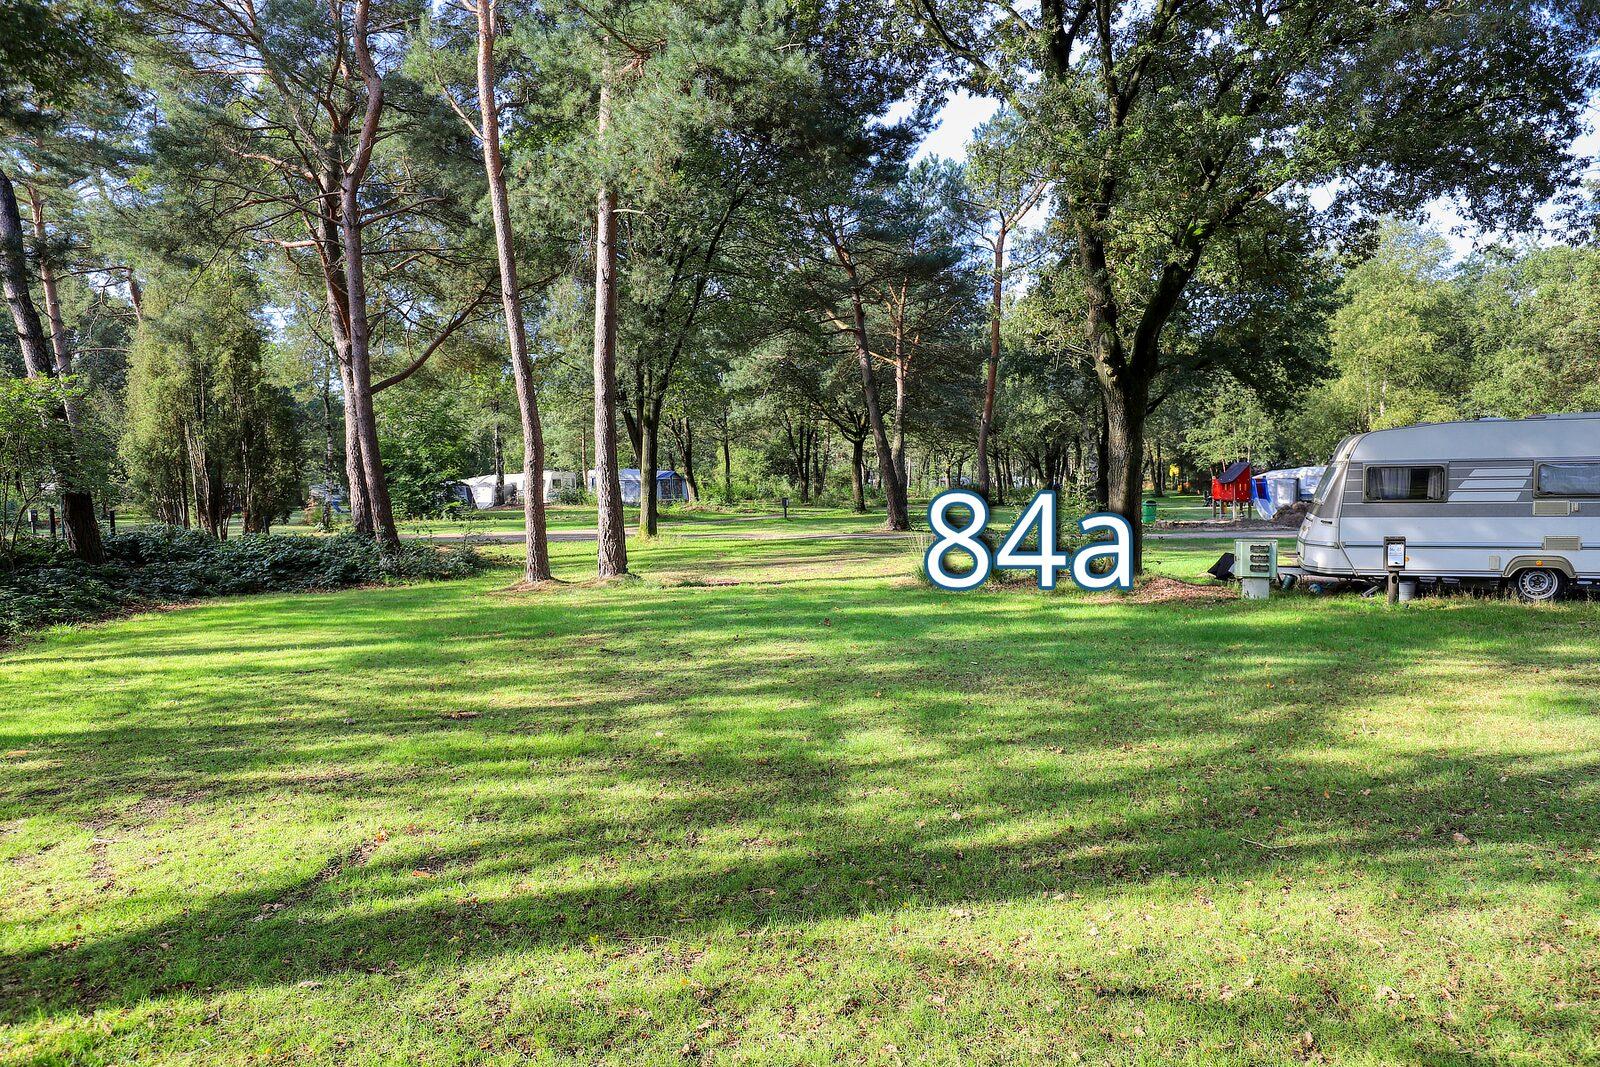 boshoek 84a